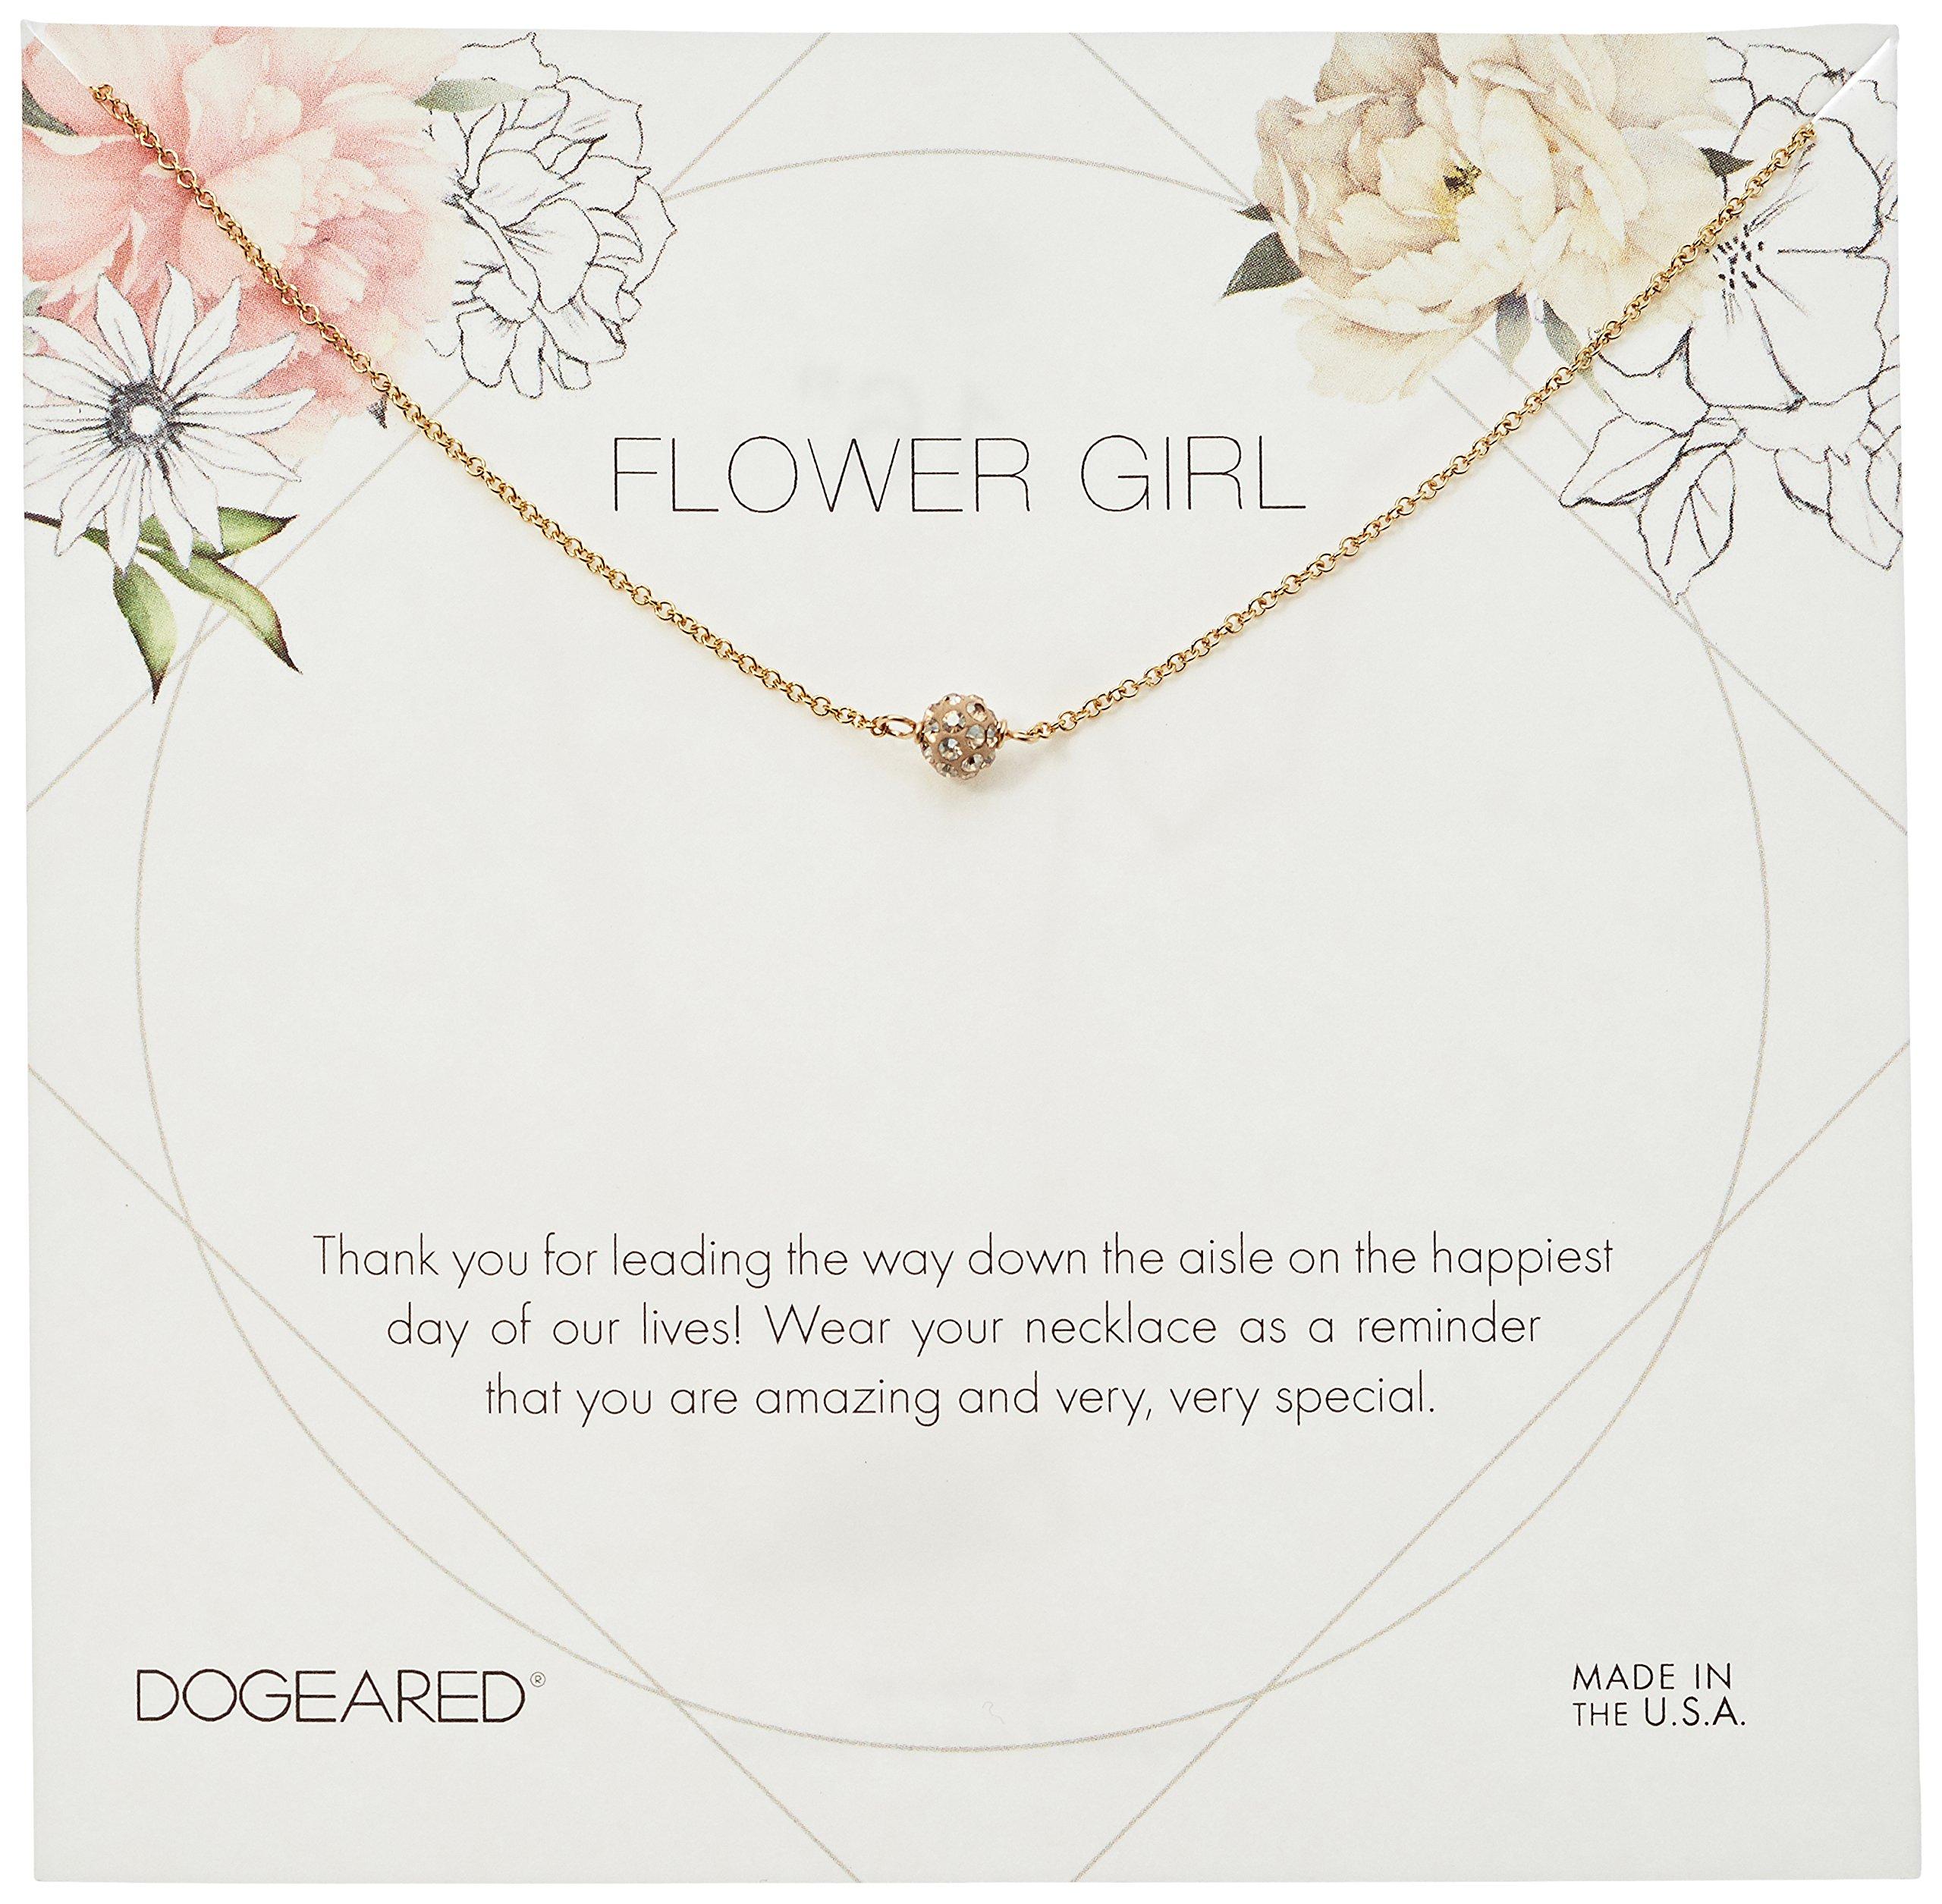 Dogeared Flower Girl Flower Card Pave Sparkle Ball Chain Neckalce, Gold, 16'' + 2'' Extension